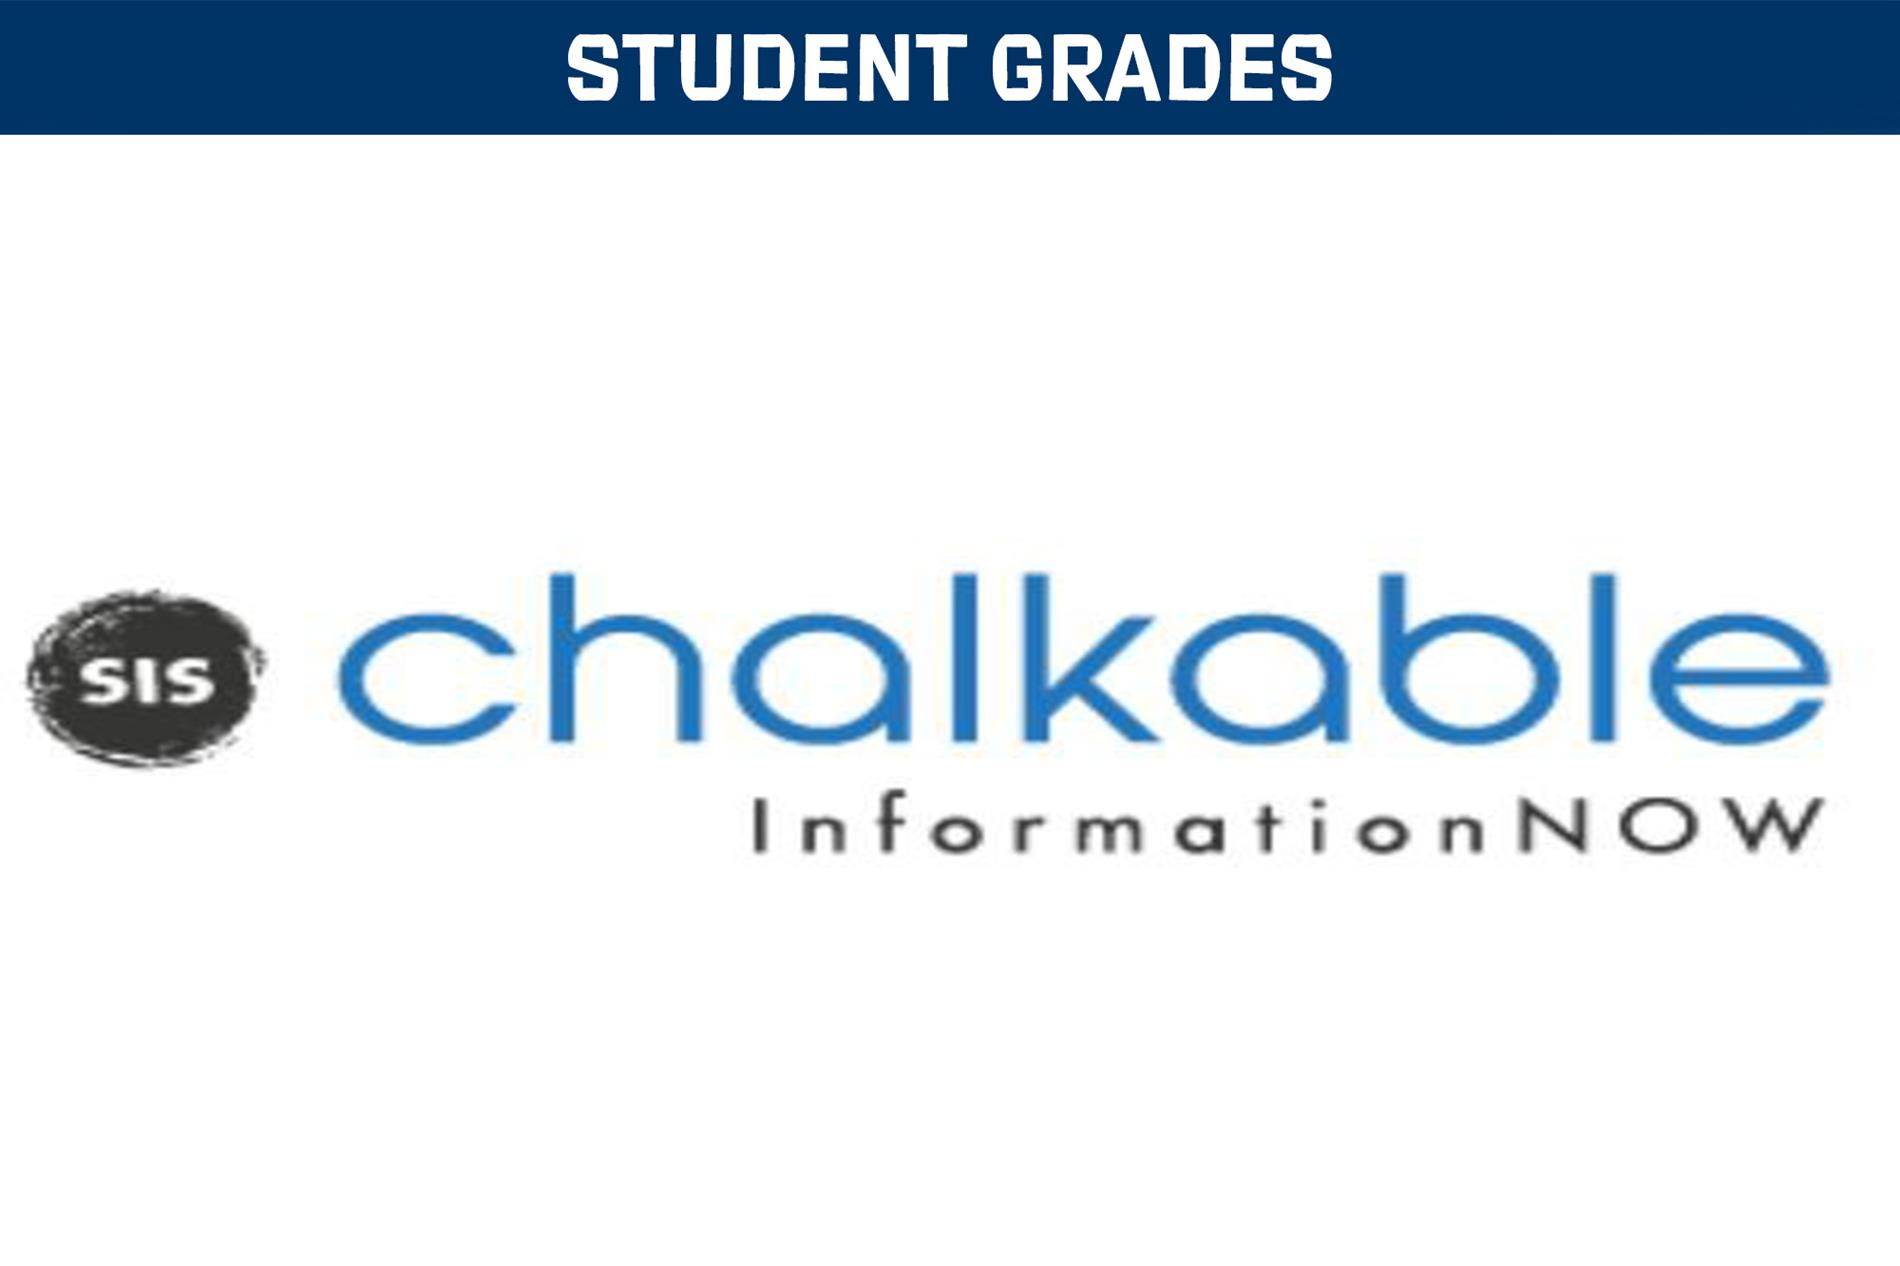 Student Grades